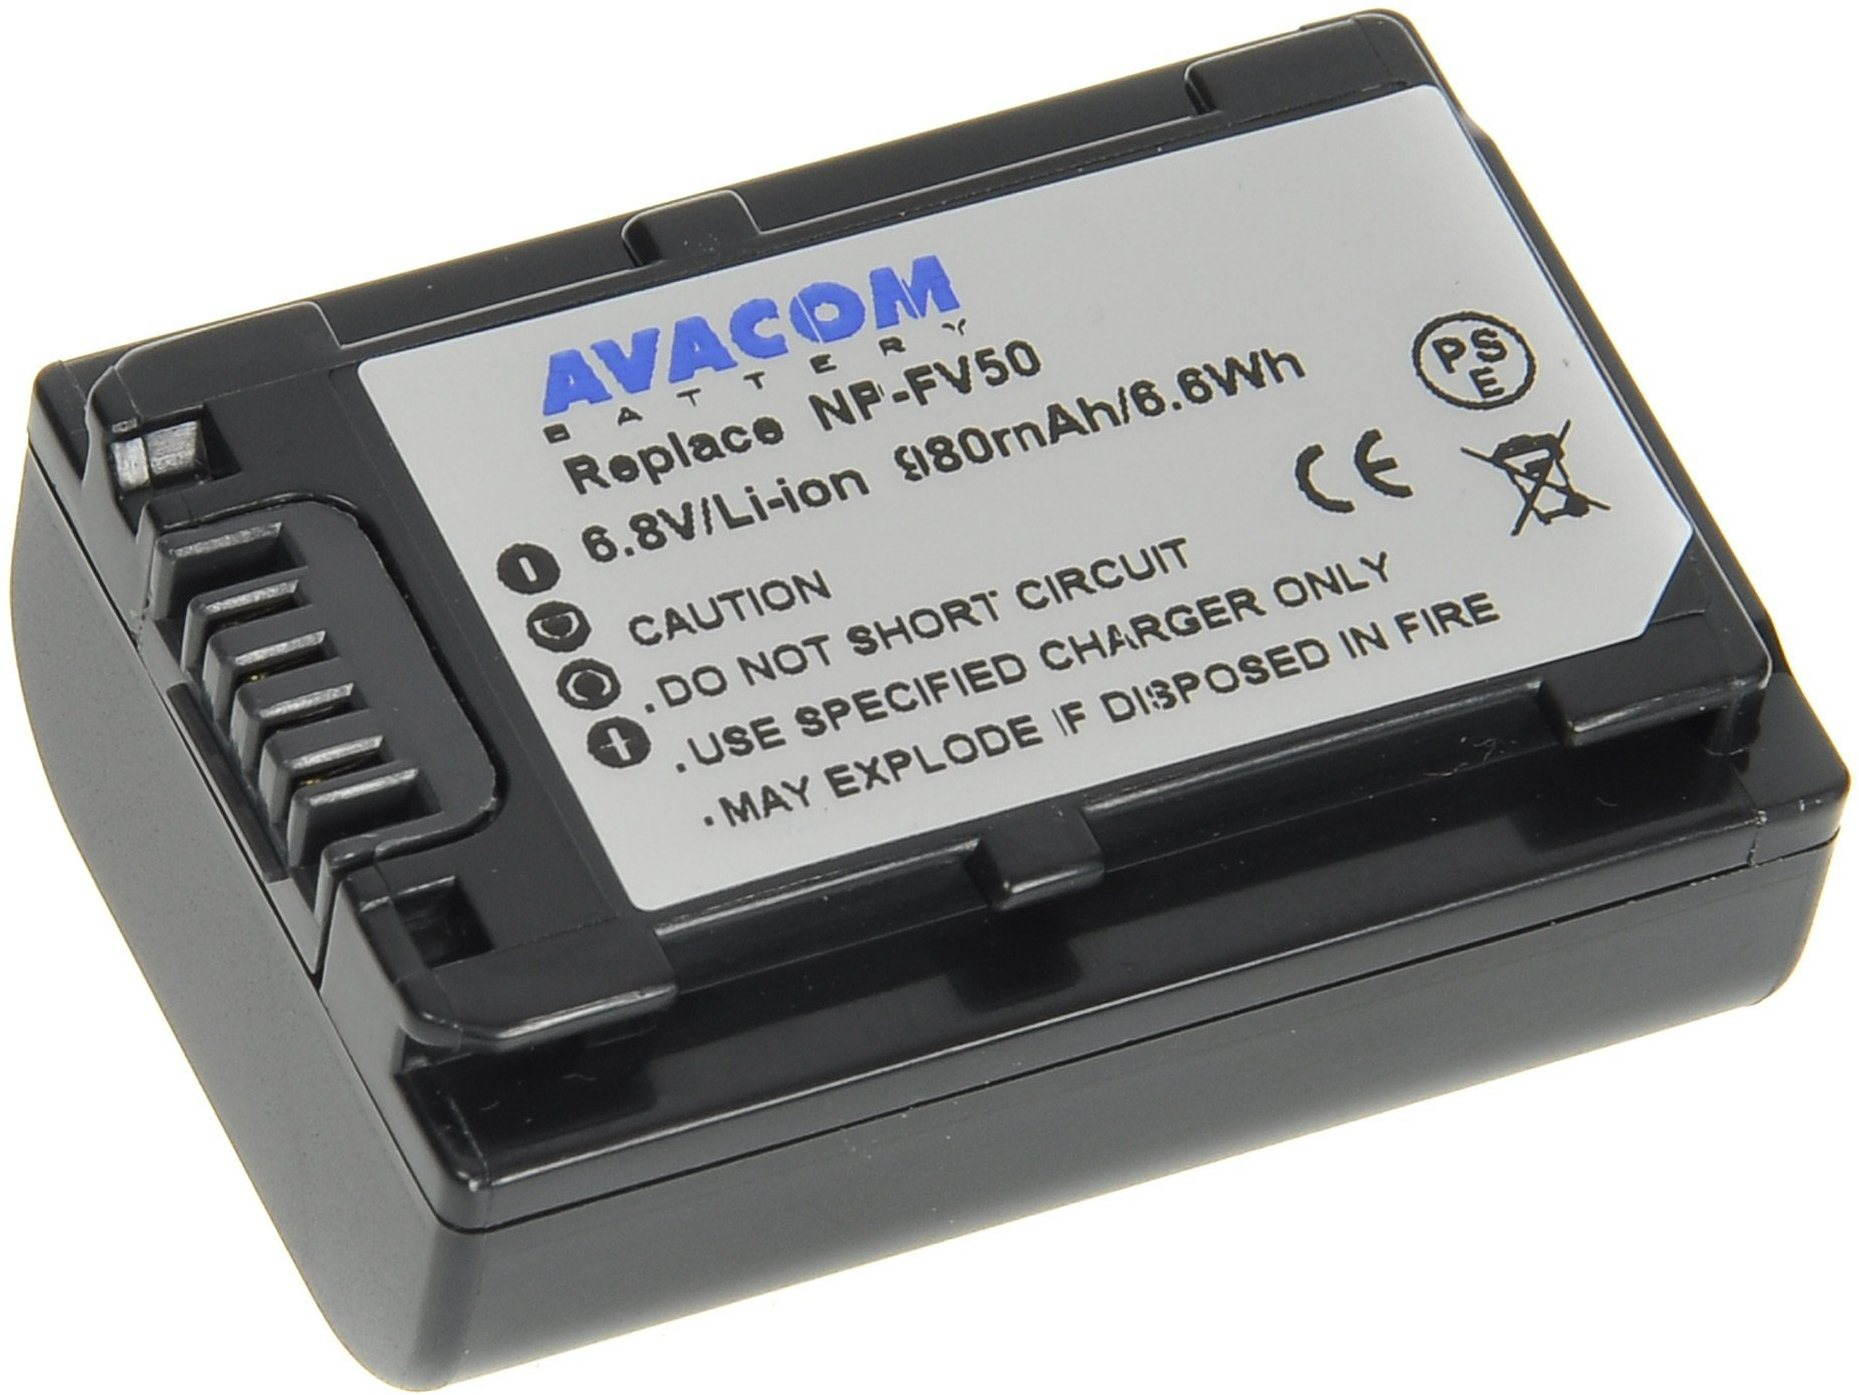 AVACOM Sony NP-FV30 készülékhez, NP-FV50 Li-ion 6,8V 980mAh 6Wh